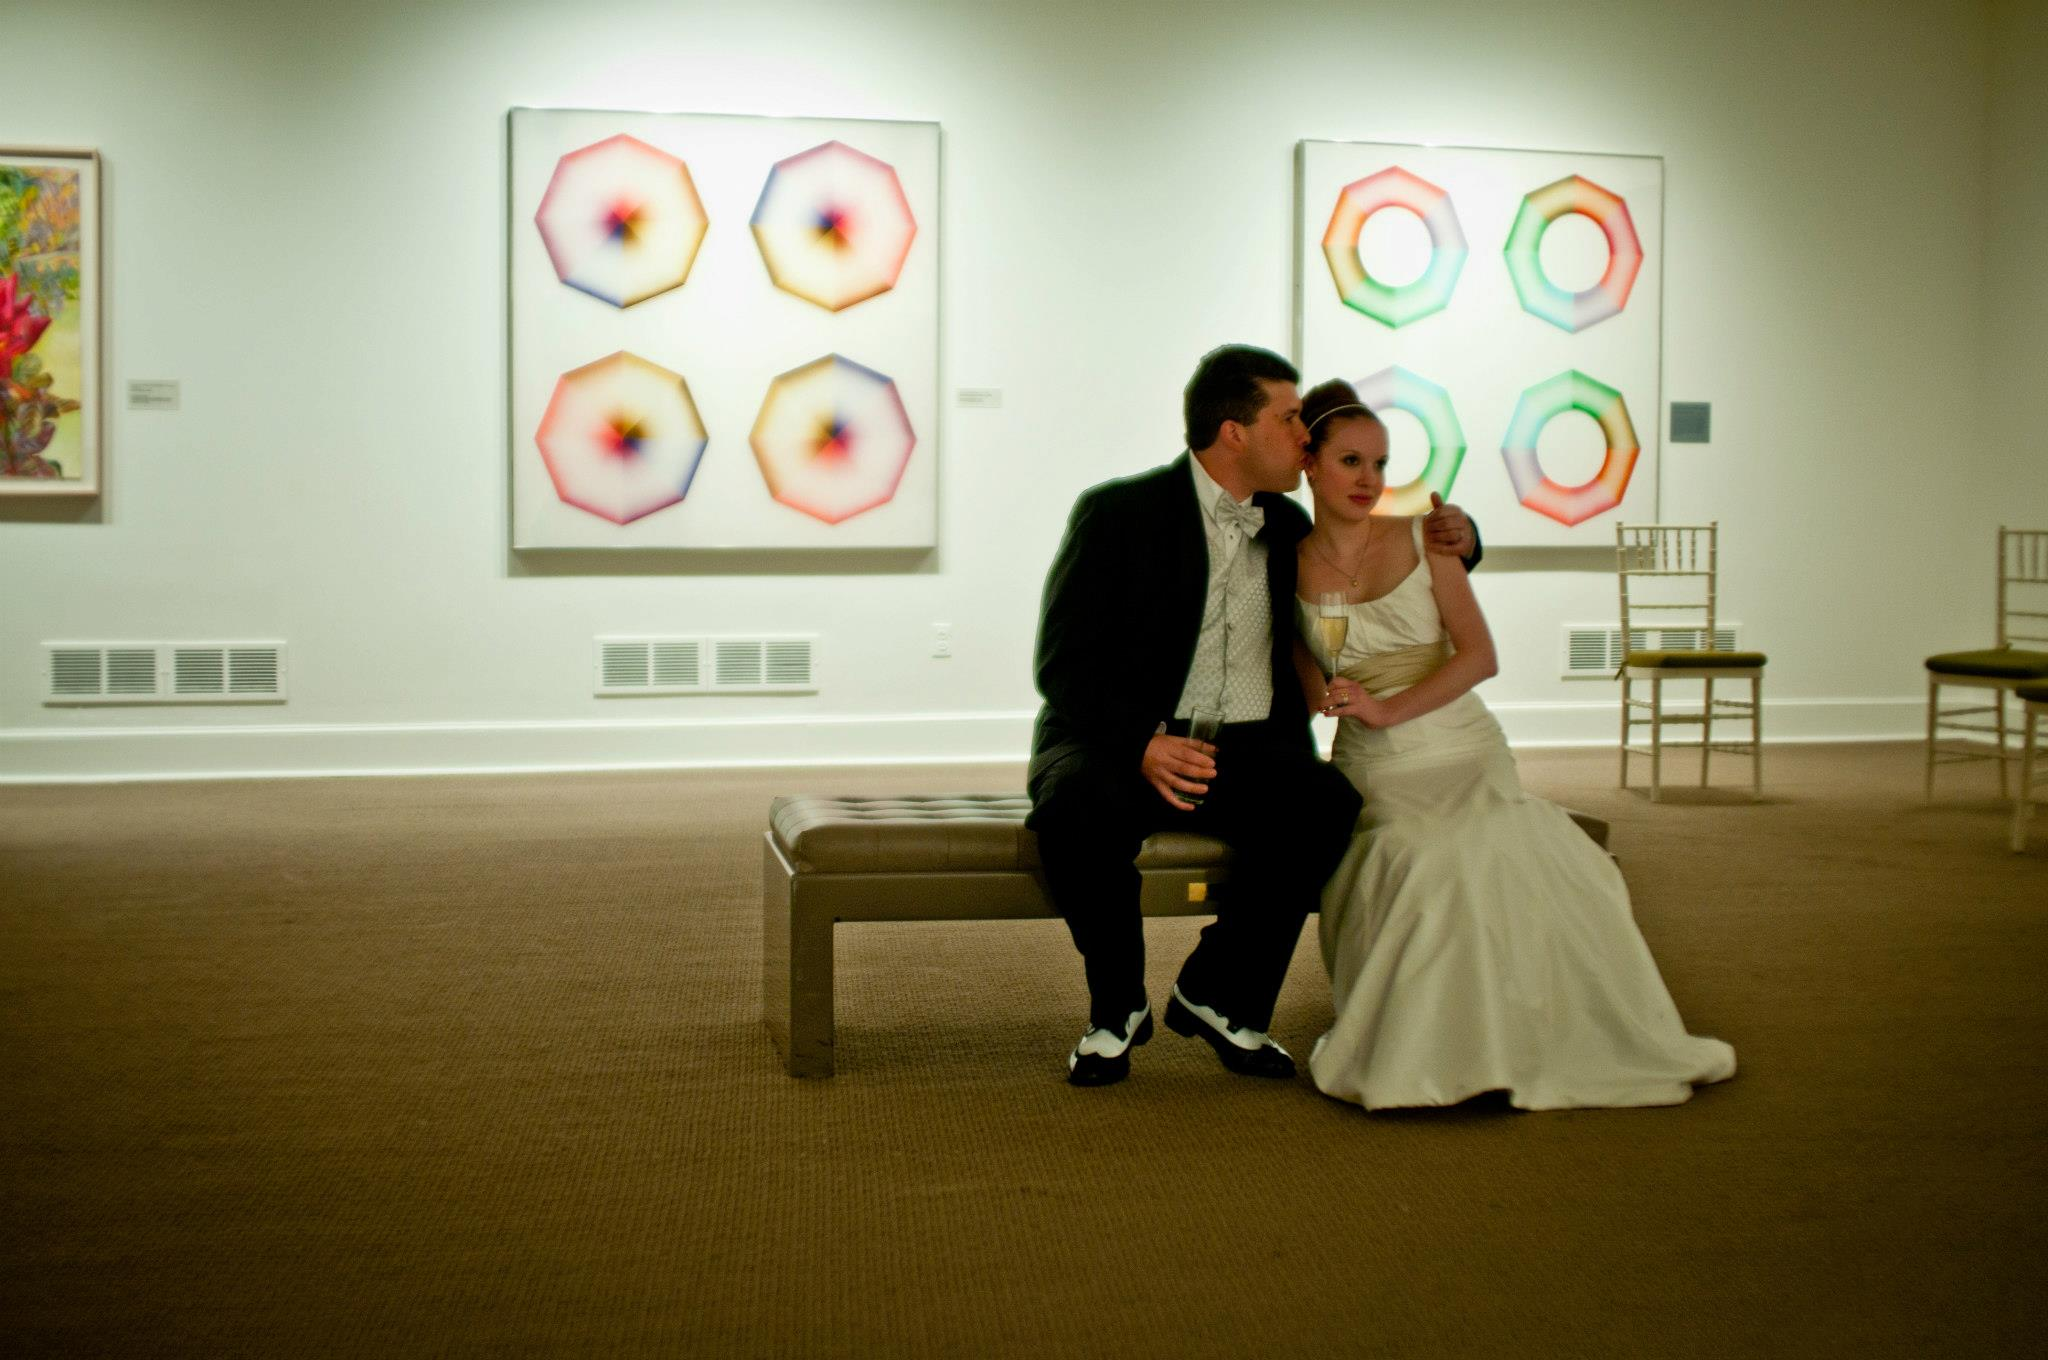 Alana & Nick - Washington, D.C.